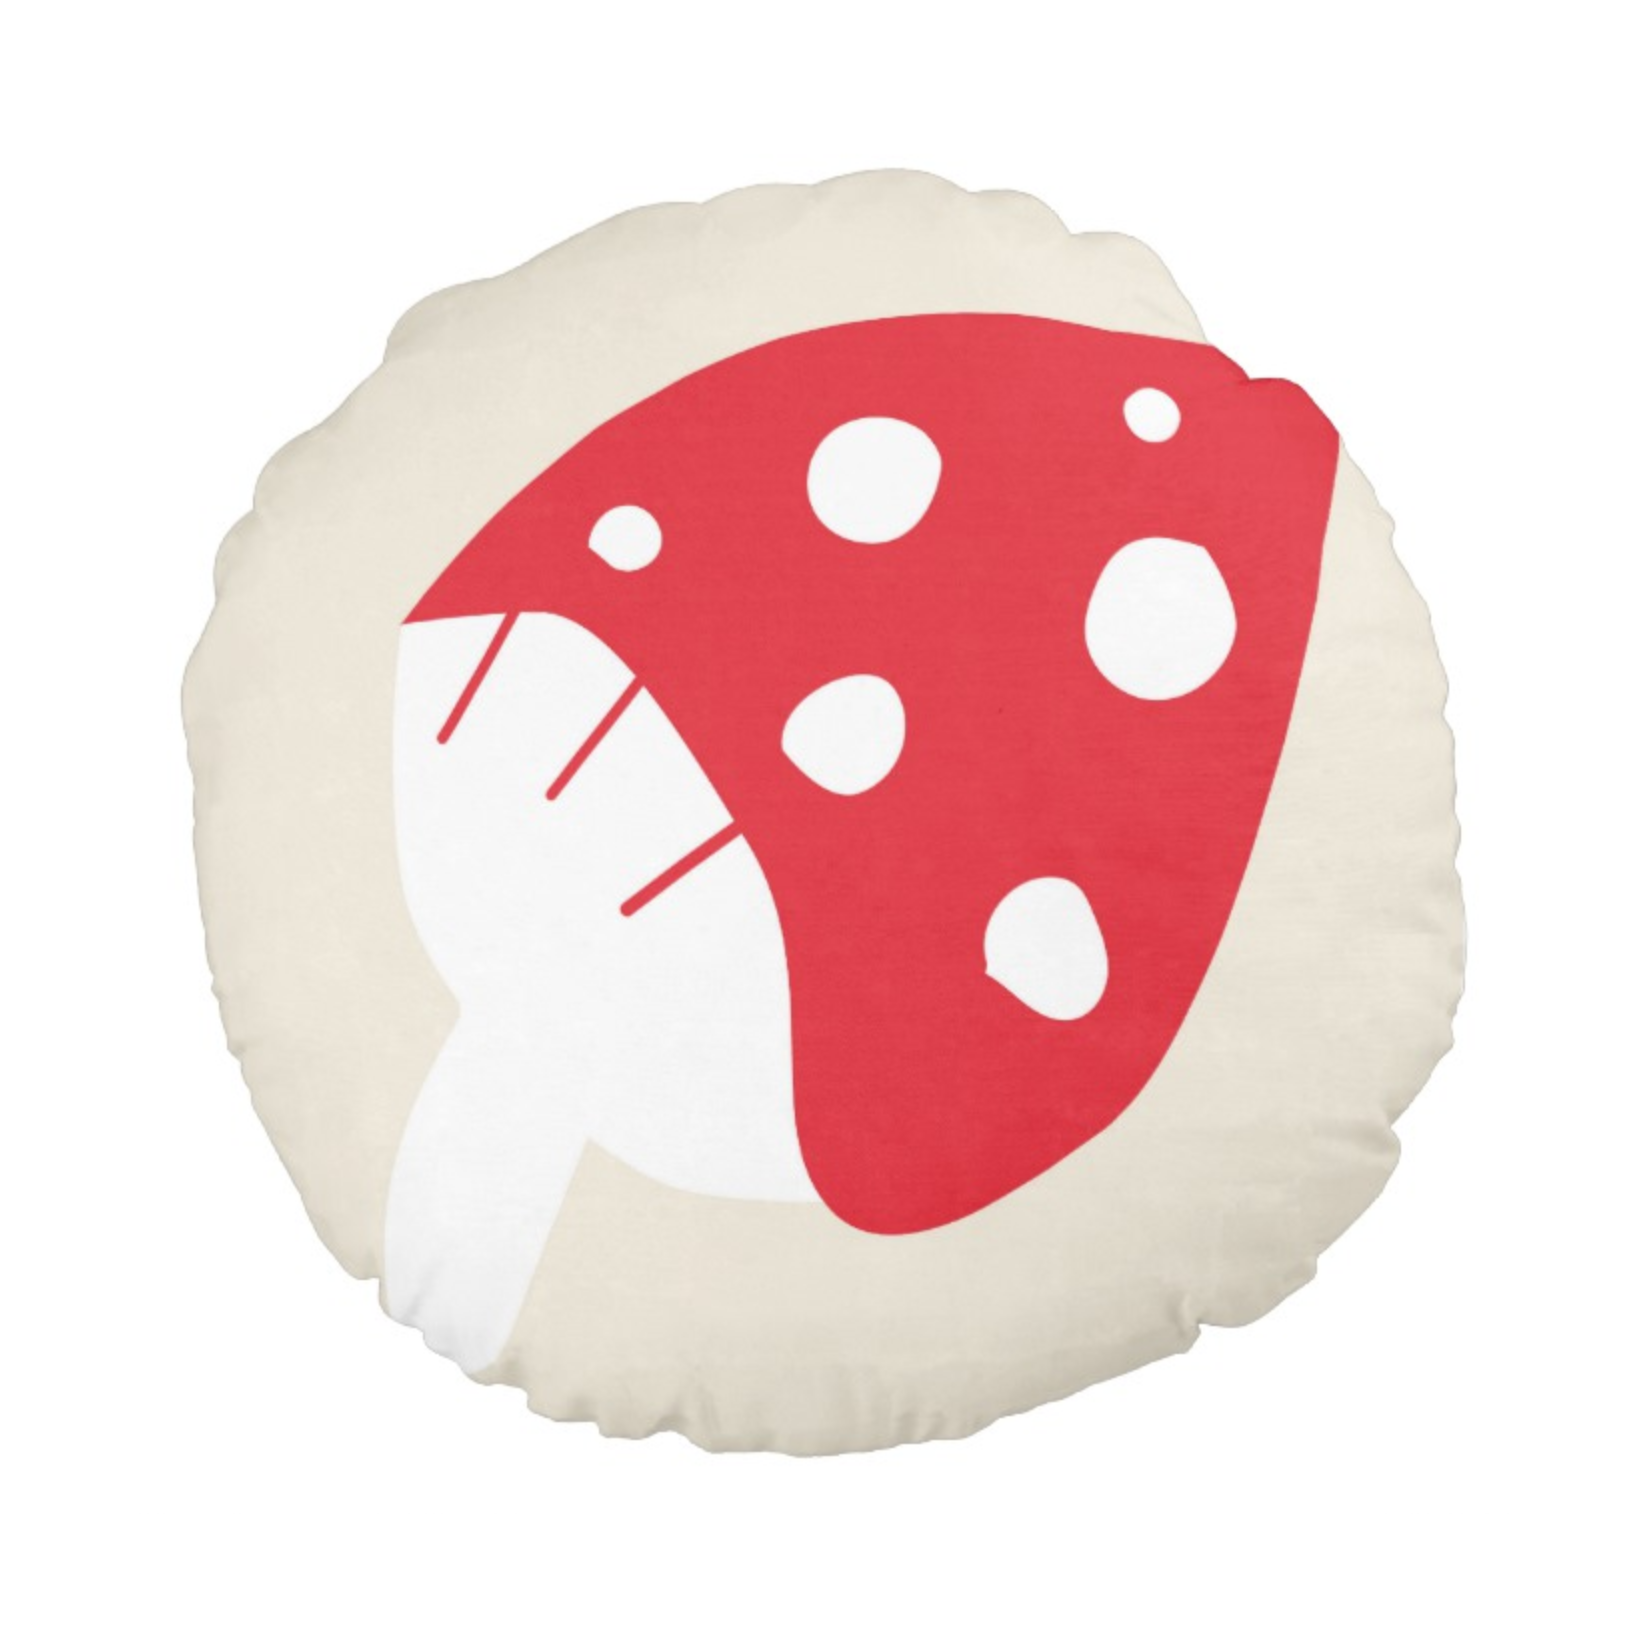 ISLET mushroom,  cushion